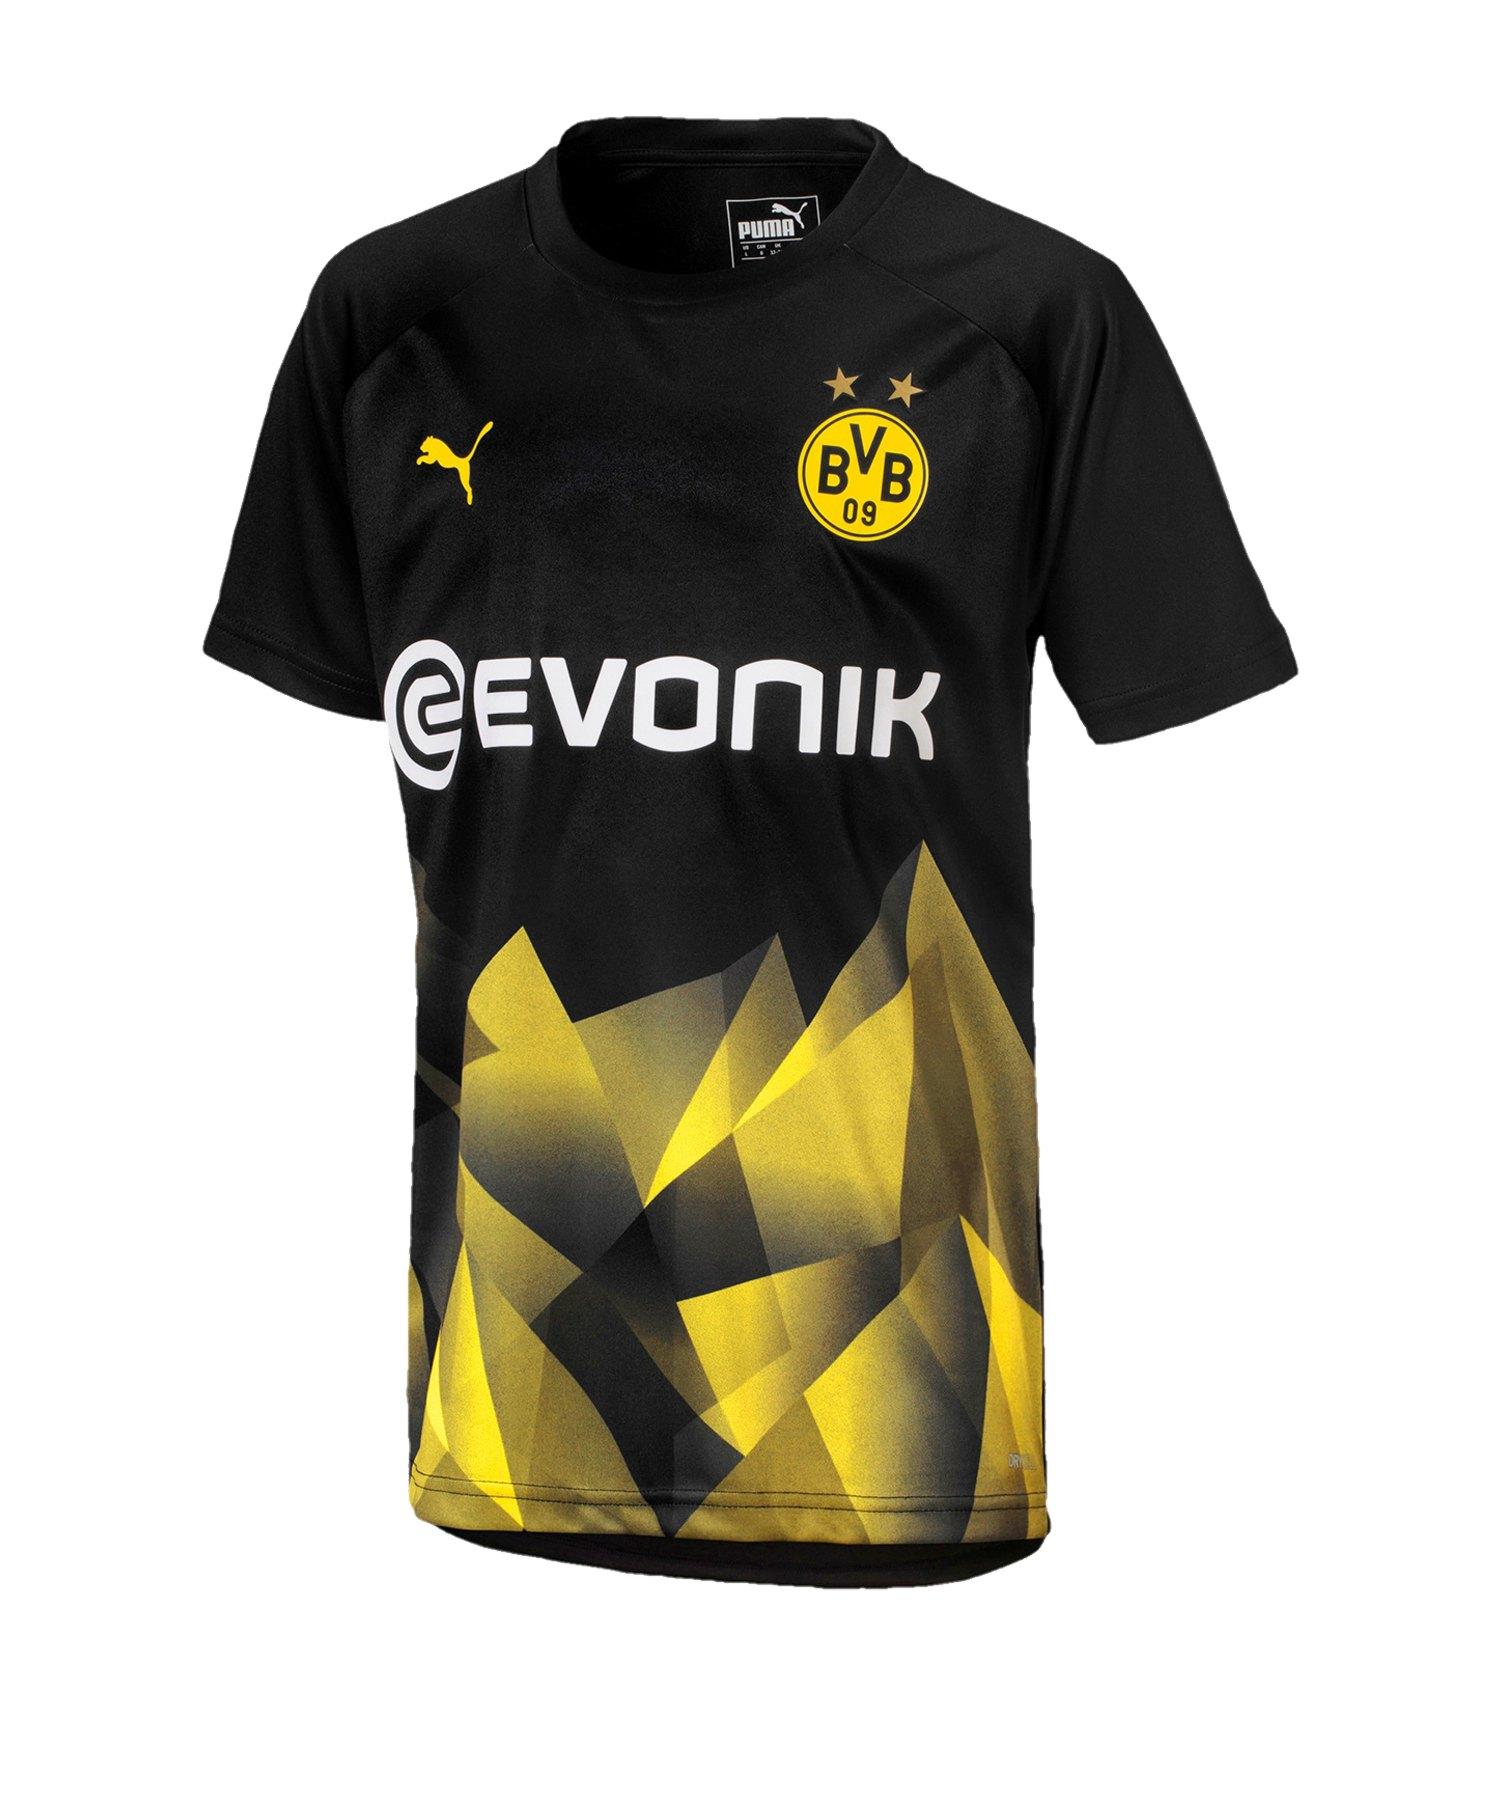 PUMA BVB Dortmund International T-Shirt Kids F02 - Schwarz